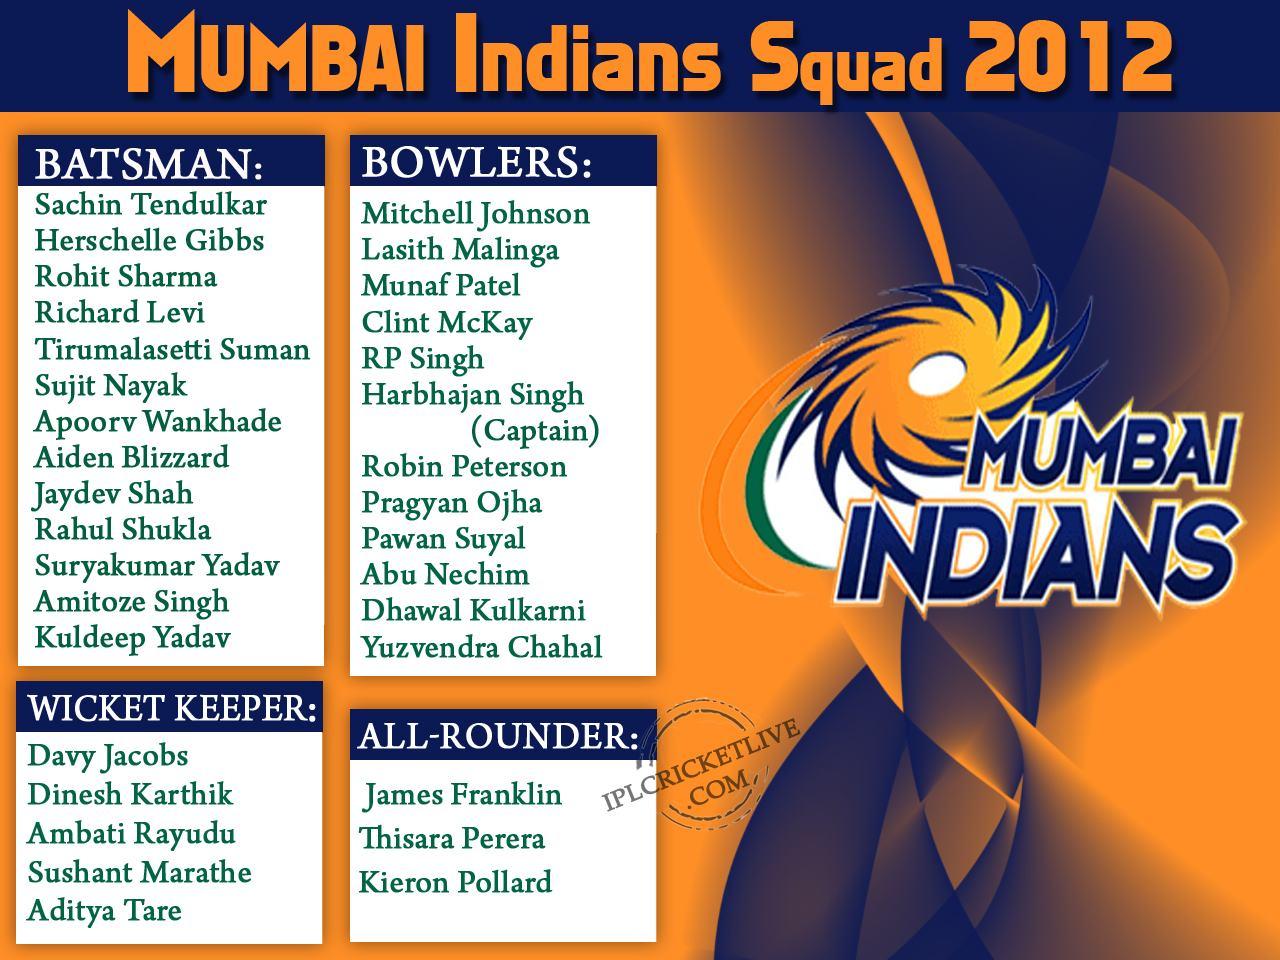 IPL 2016, Indian Premier League 2016 - Mumbai Indians Squad 2012